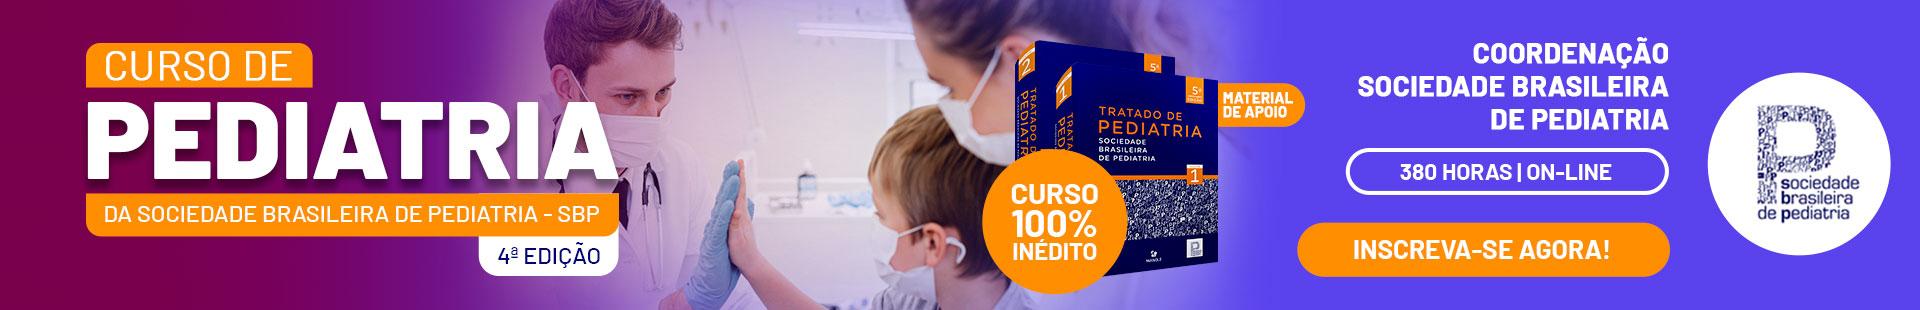 4º CURSO DE PEDIATRIA